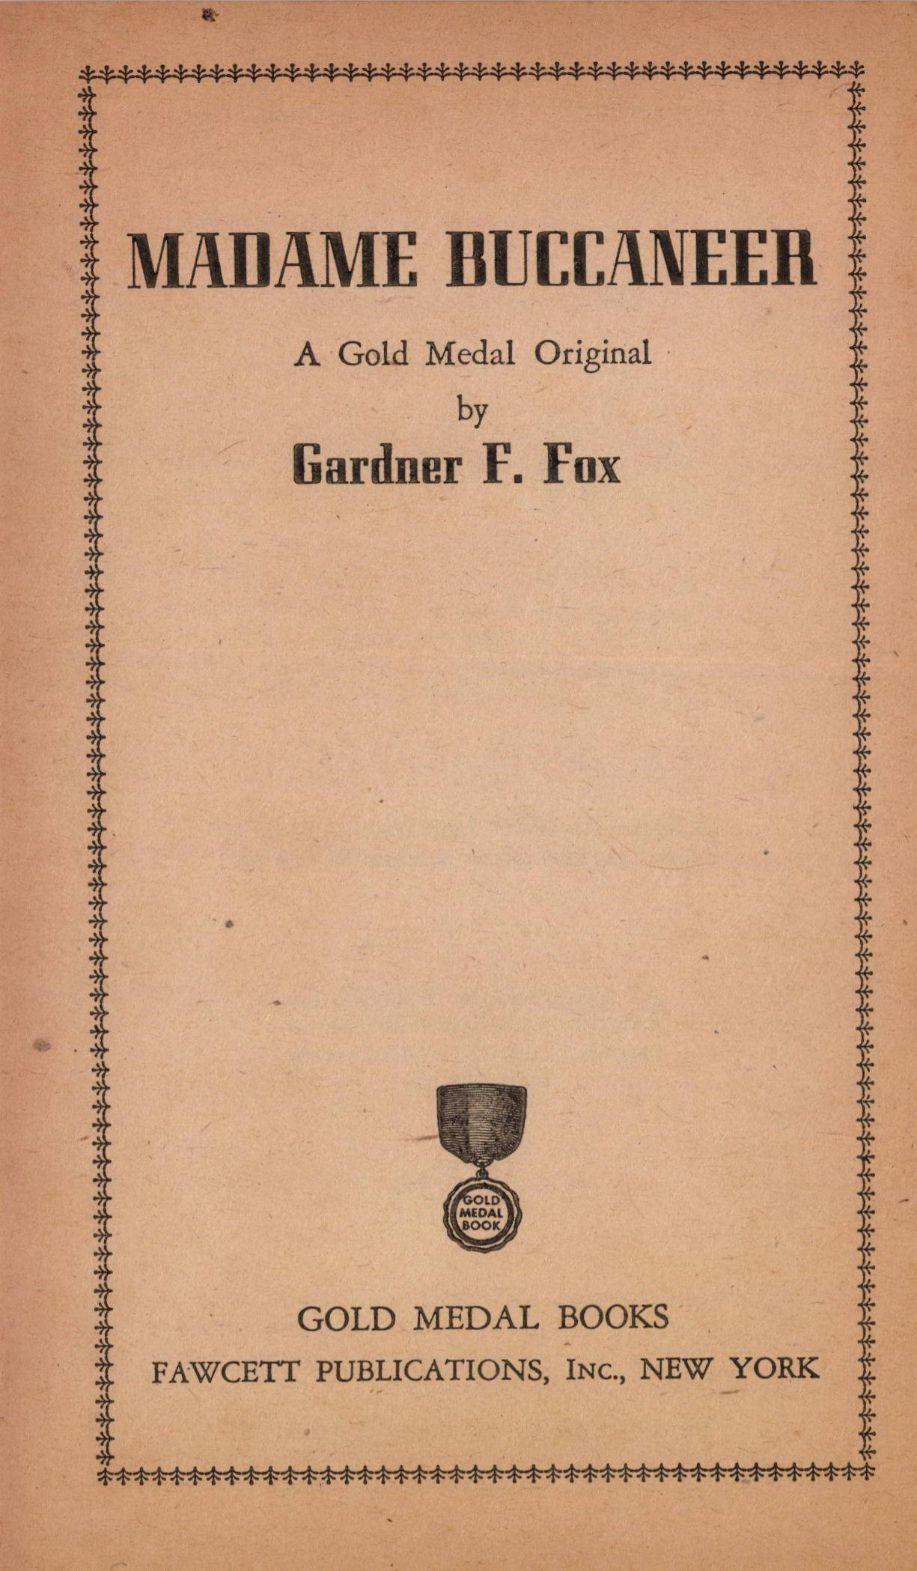 Madame Buccaneer Gardner F Fox 004.jpg